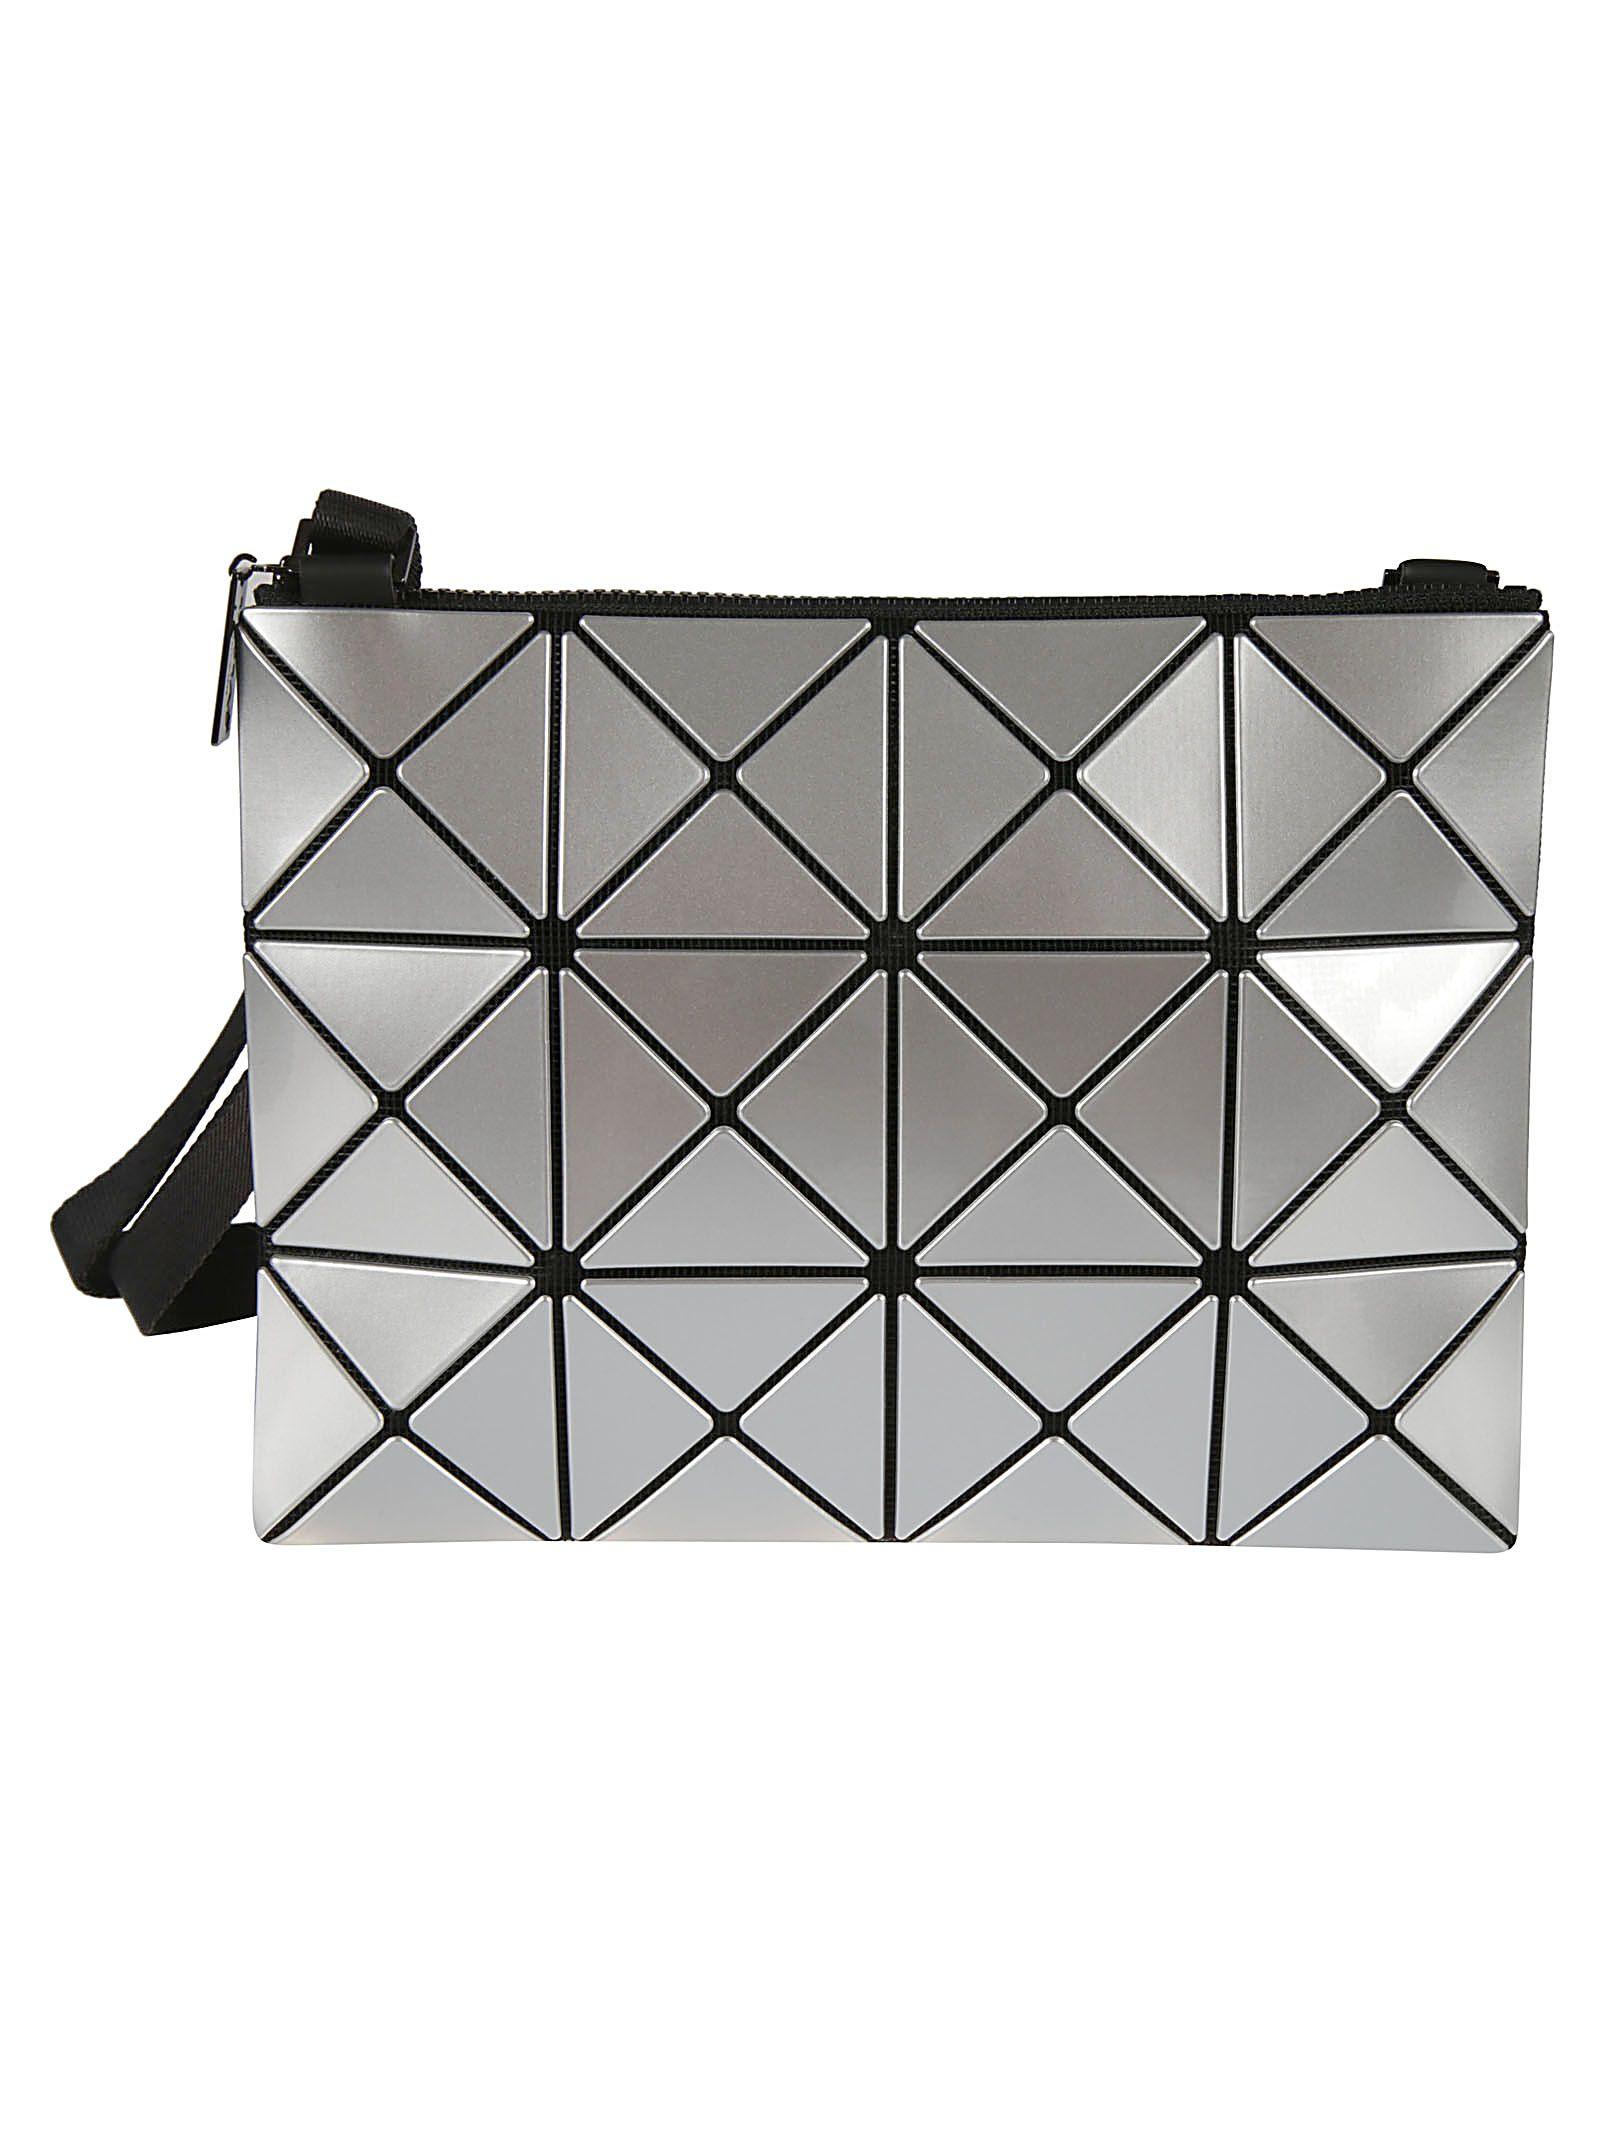 8cb9f831c5 Bao Bao Issey Miyake Geometric Shoulder Bag